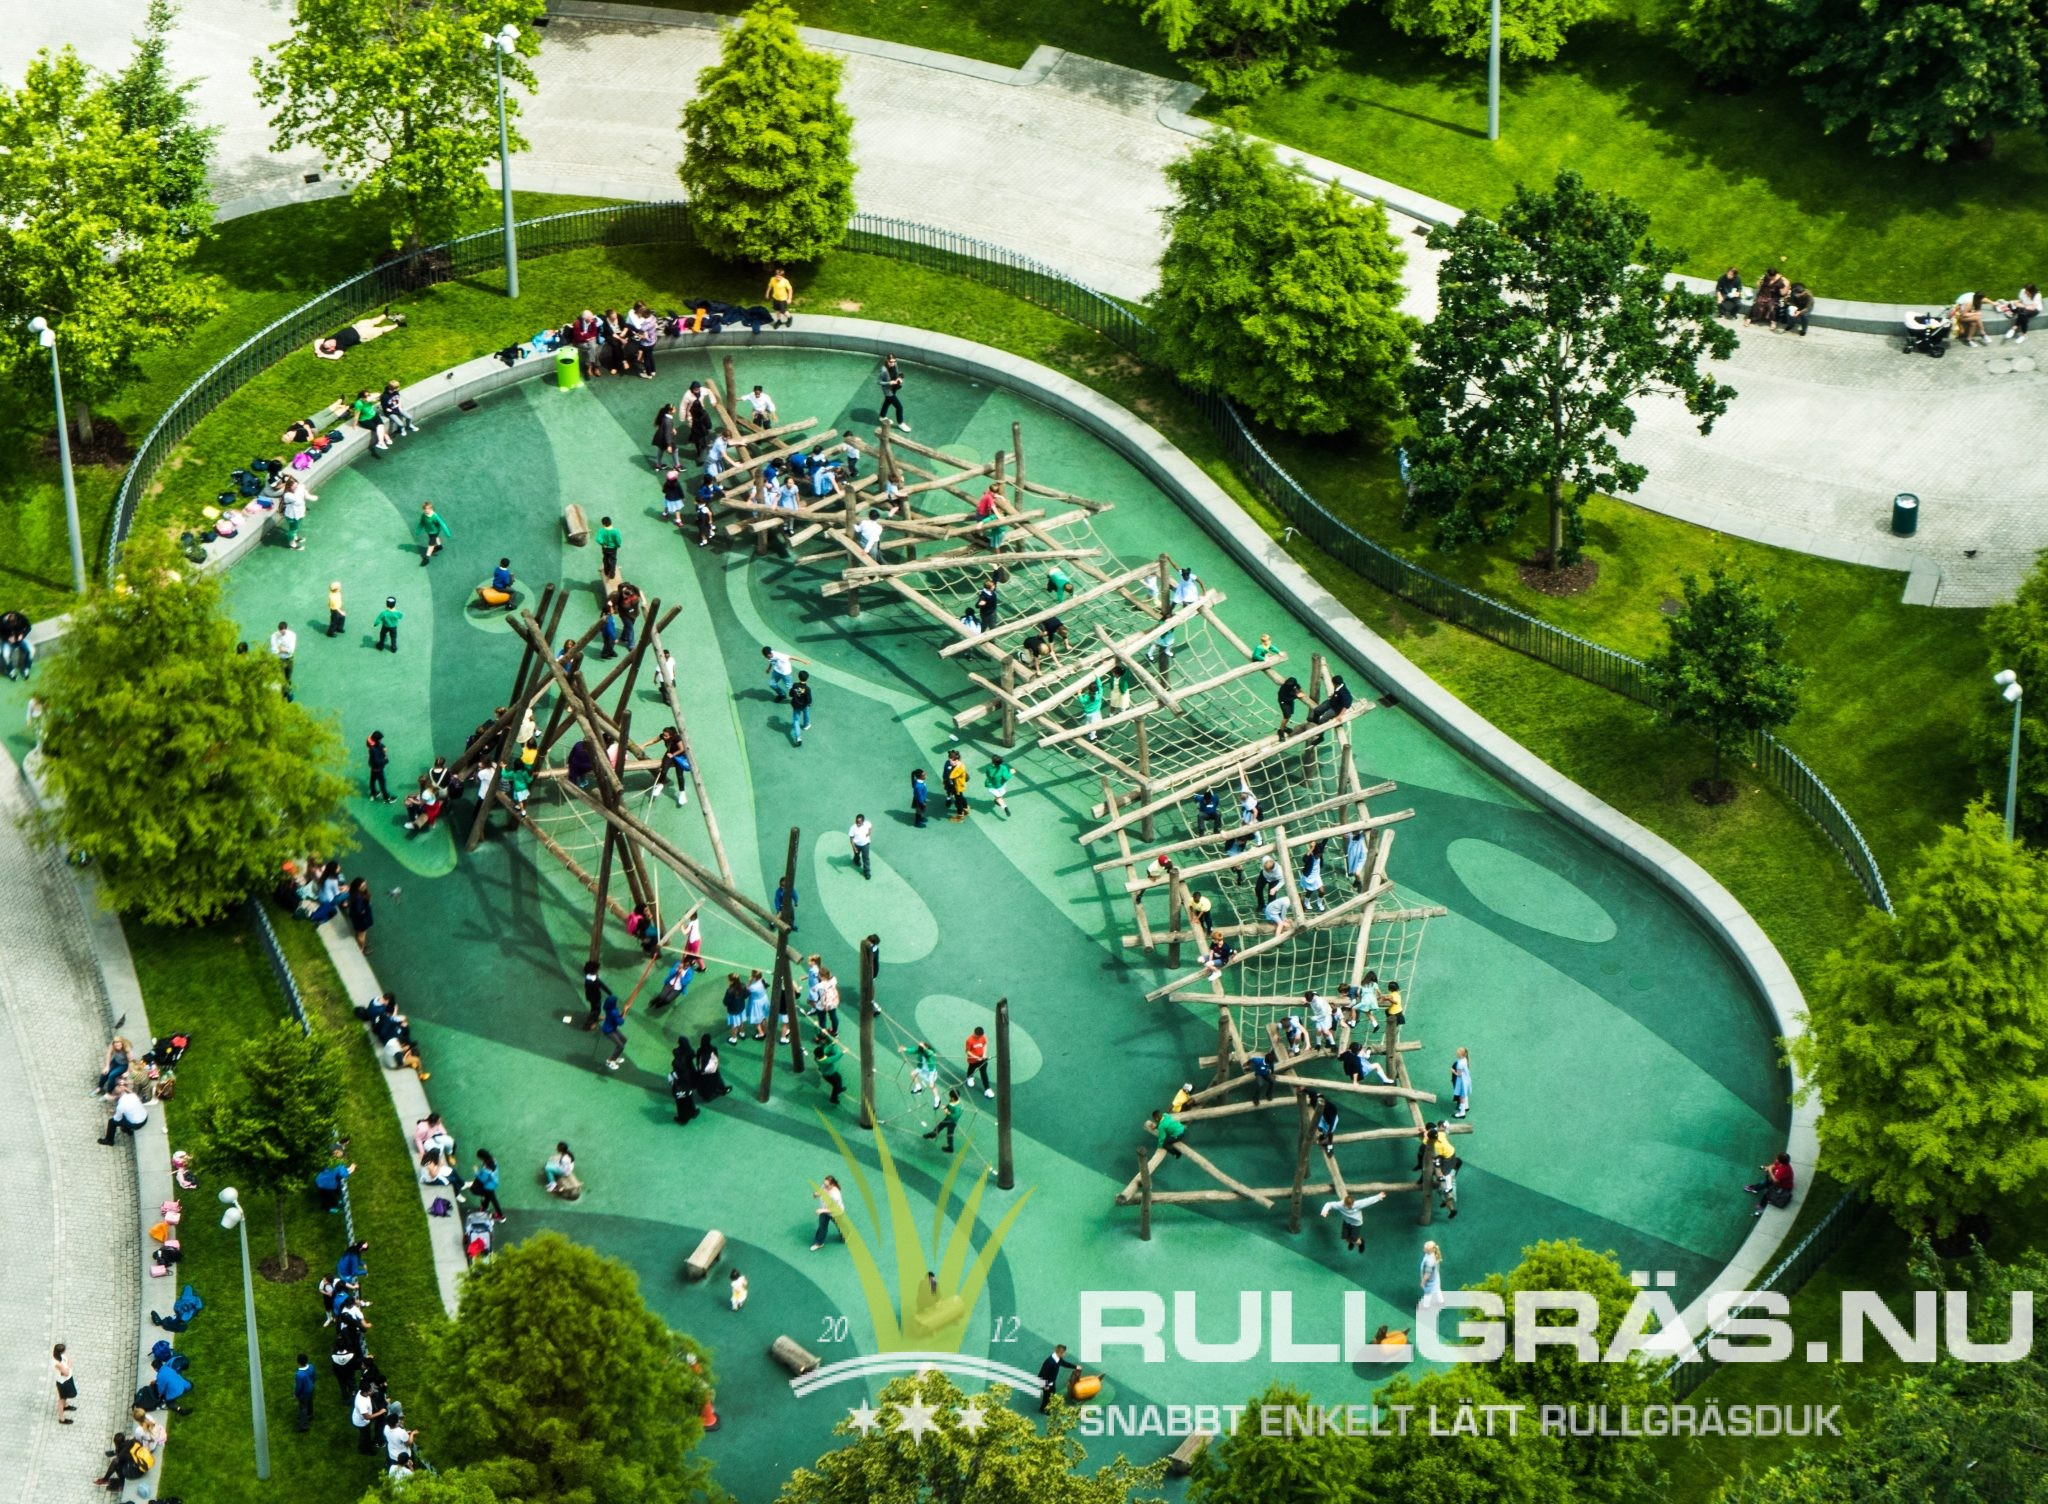 Rullgräs Poolområde Gräsmatta Rullgräs.nu